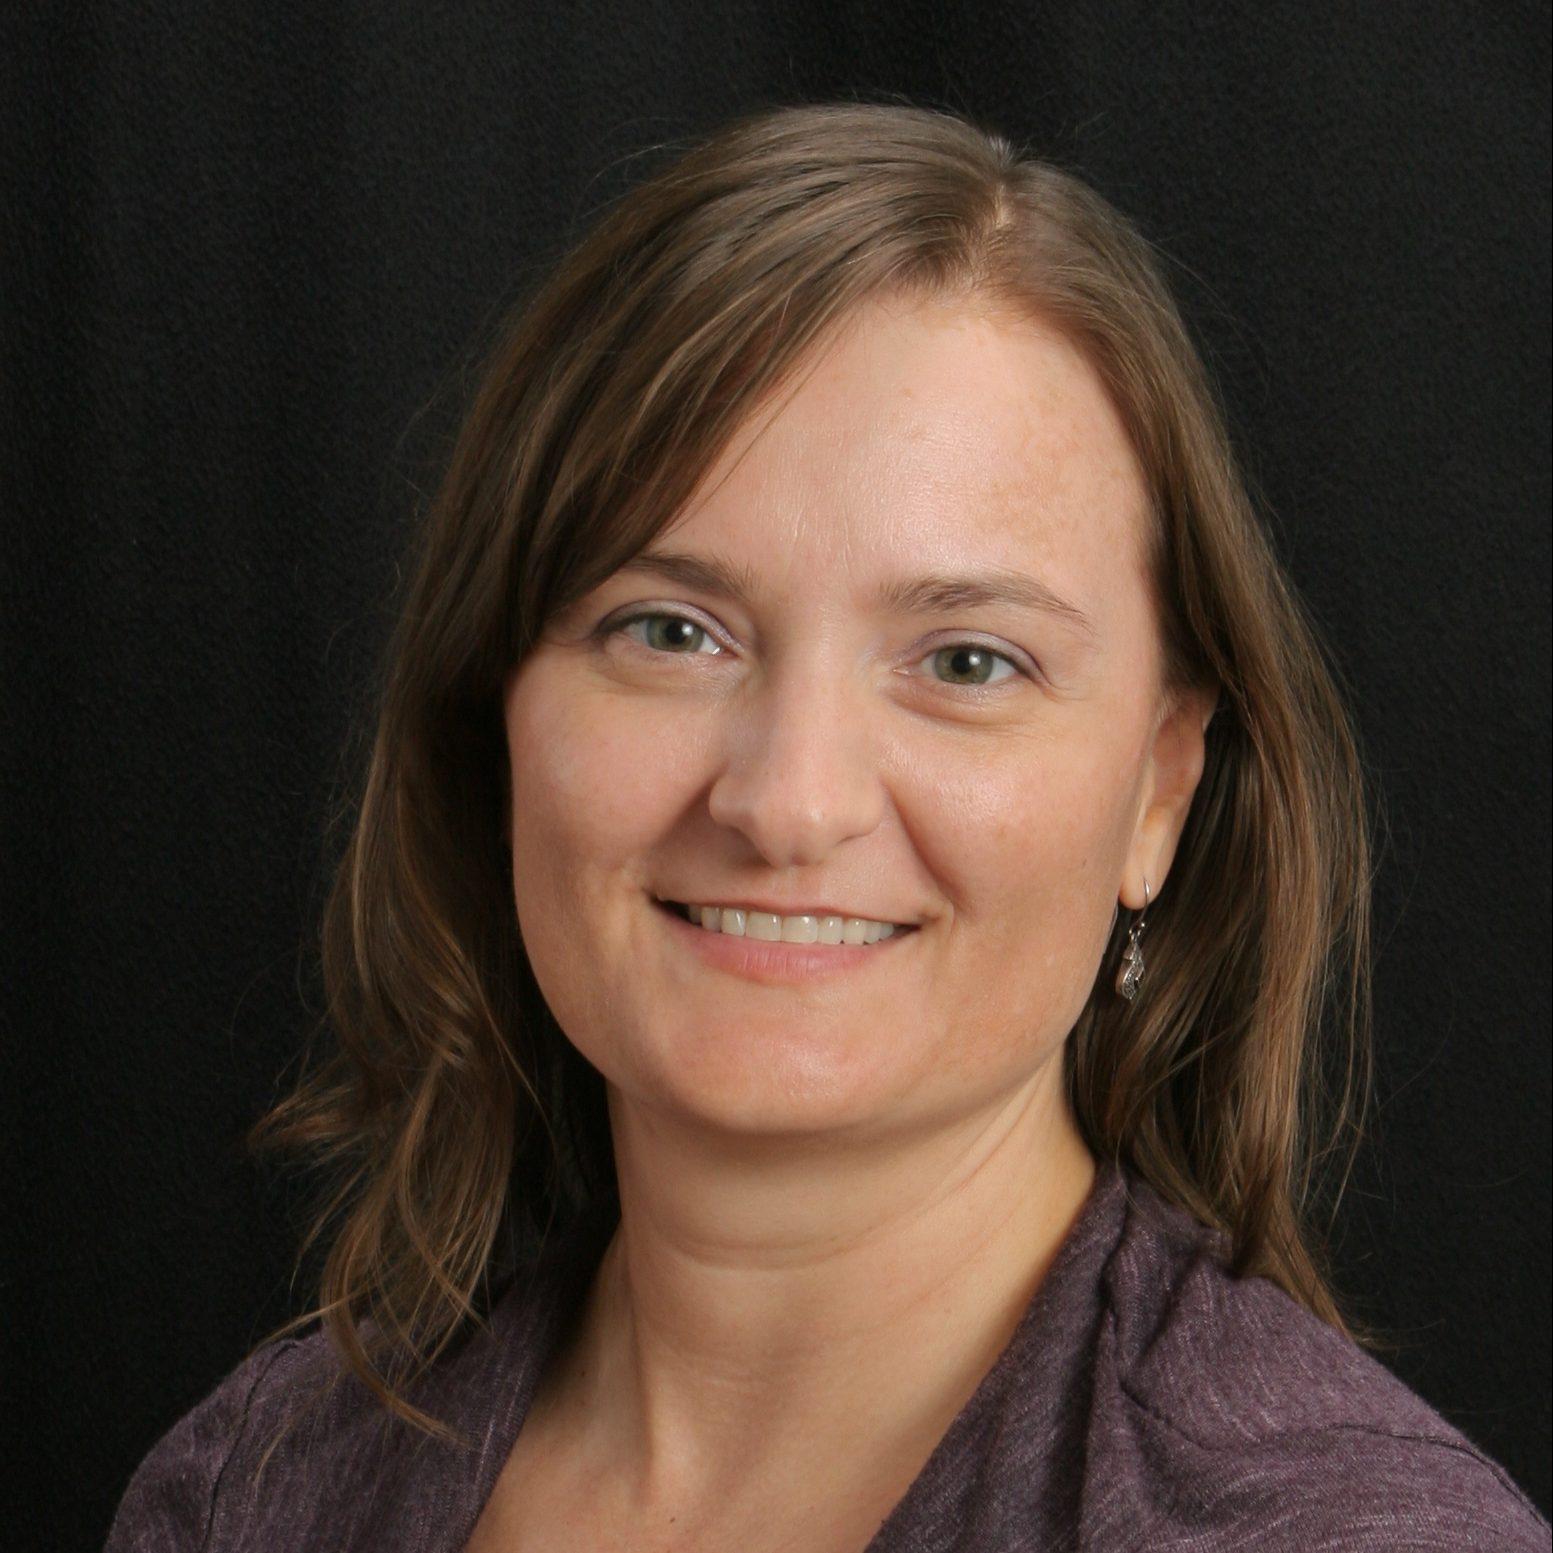 Dr. Debra Jackson - Headshot